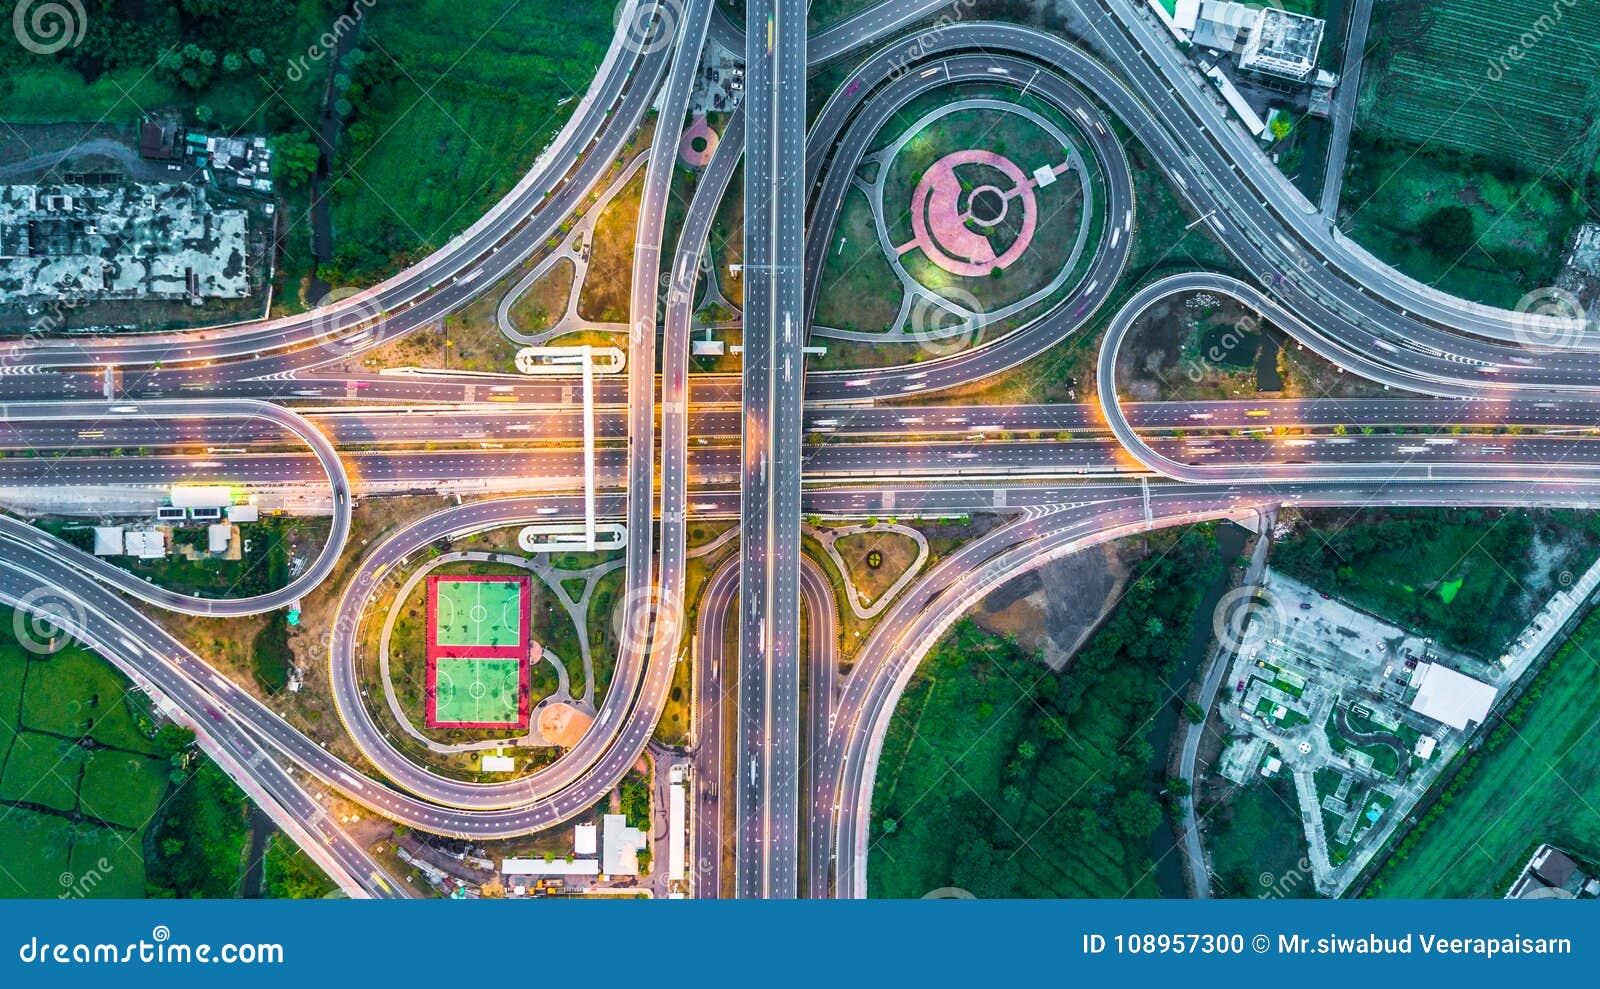 Highway, Expressway, Motorway, Toll way at night, Aerial view in